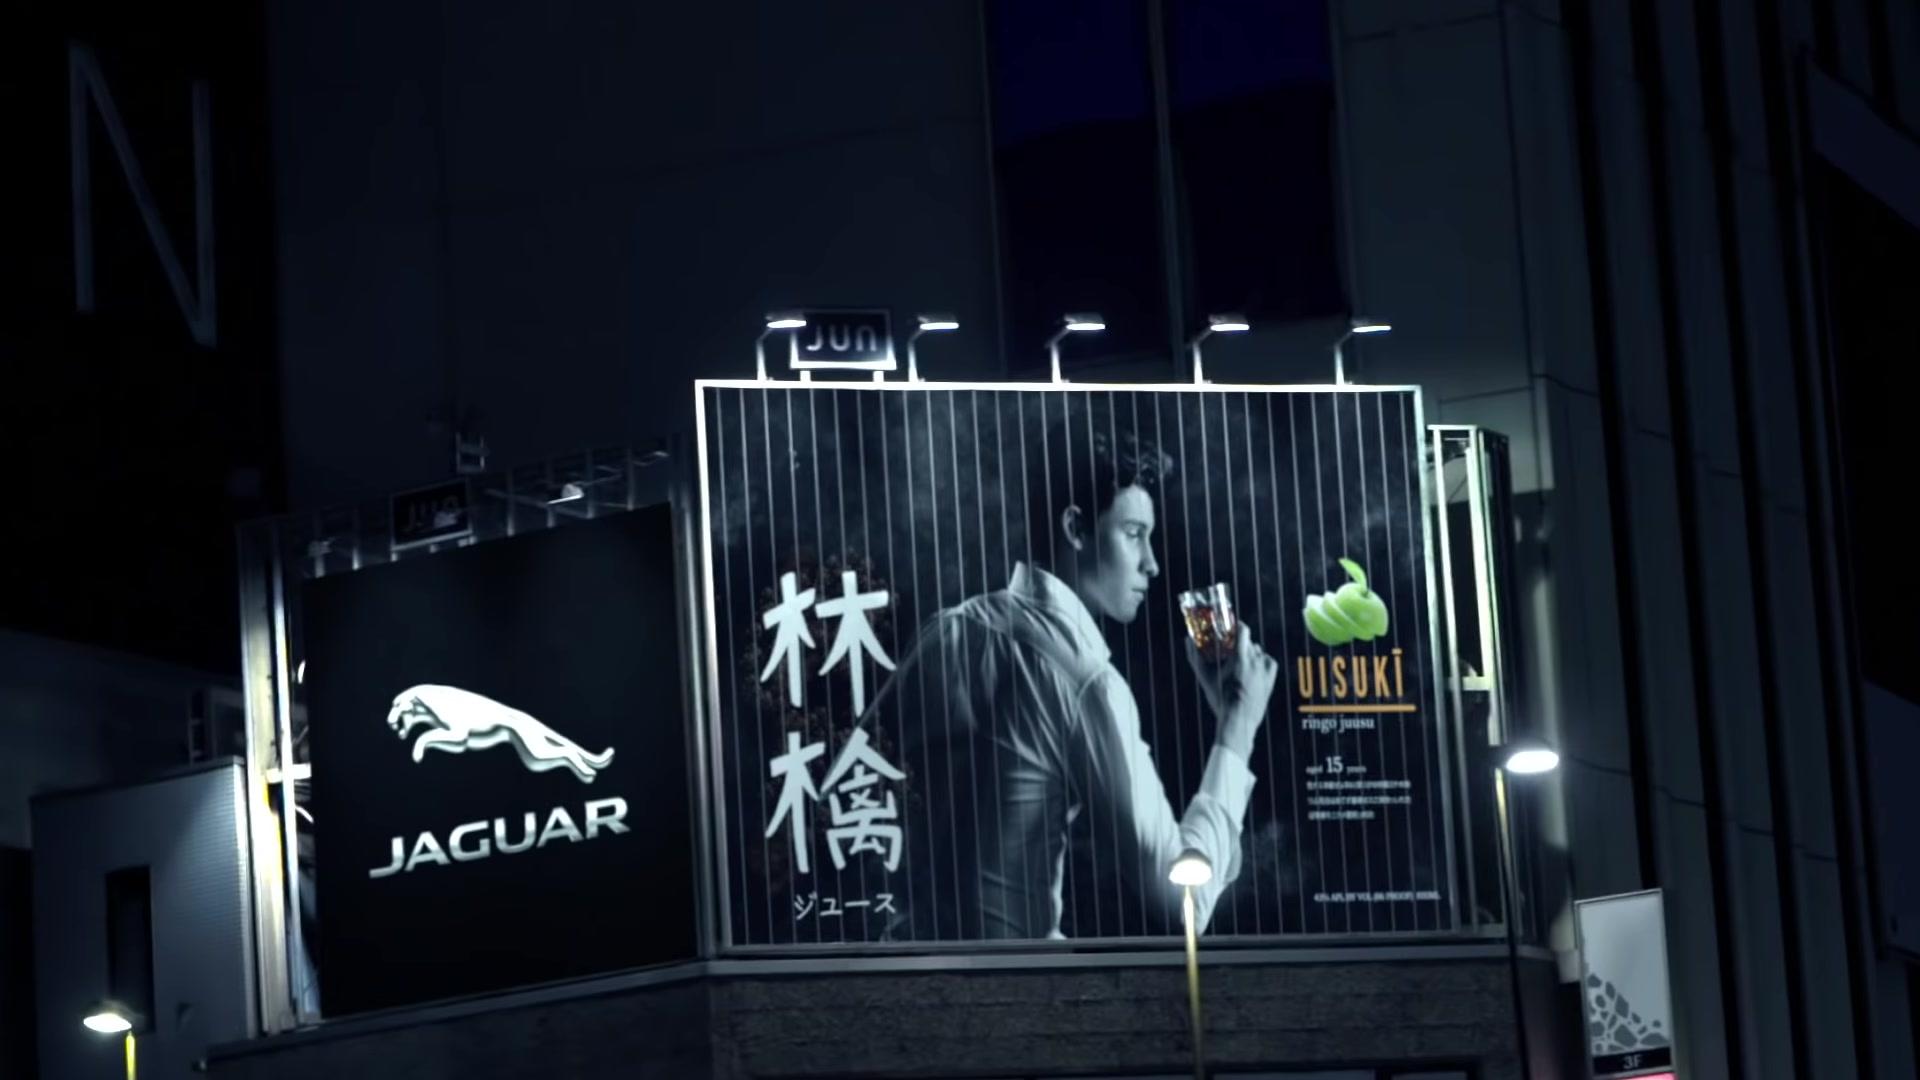 Jaguar Billboard In Lost In Japan By Shawn Mendes And Zedd